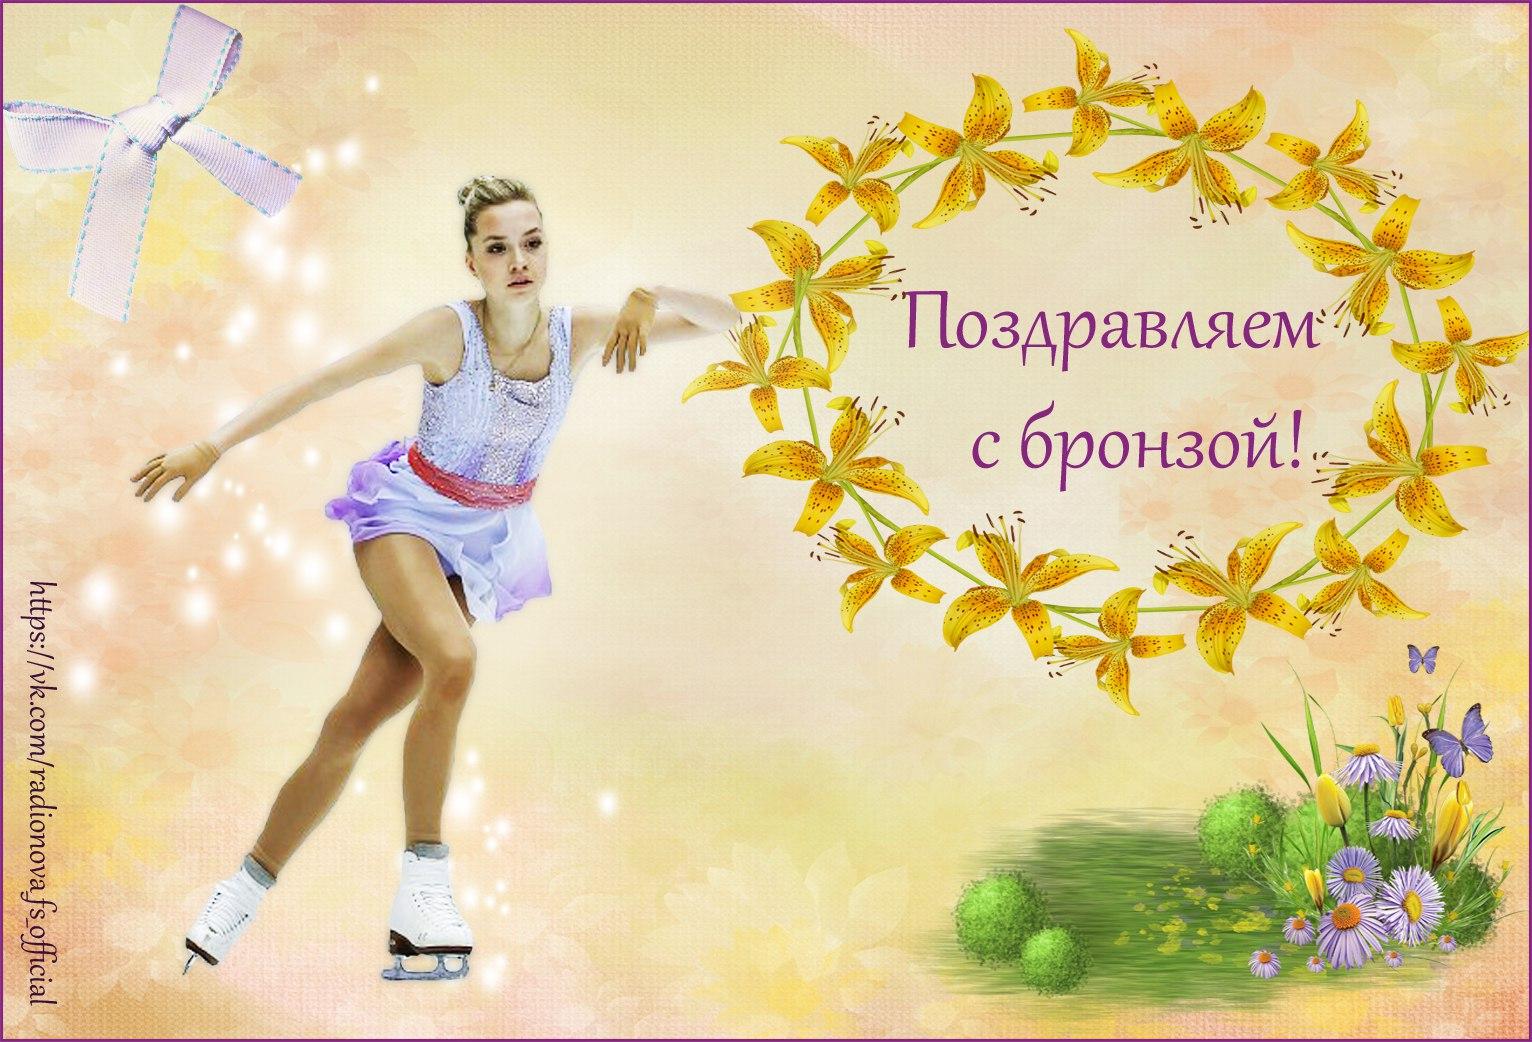 Елена Радионова - 2 - Страница 6 JV-vTIx1NjE